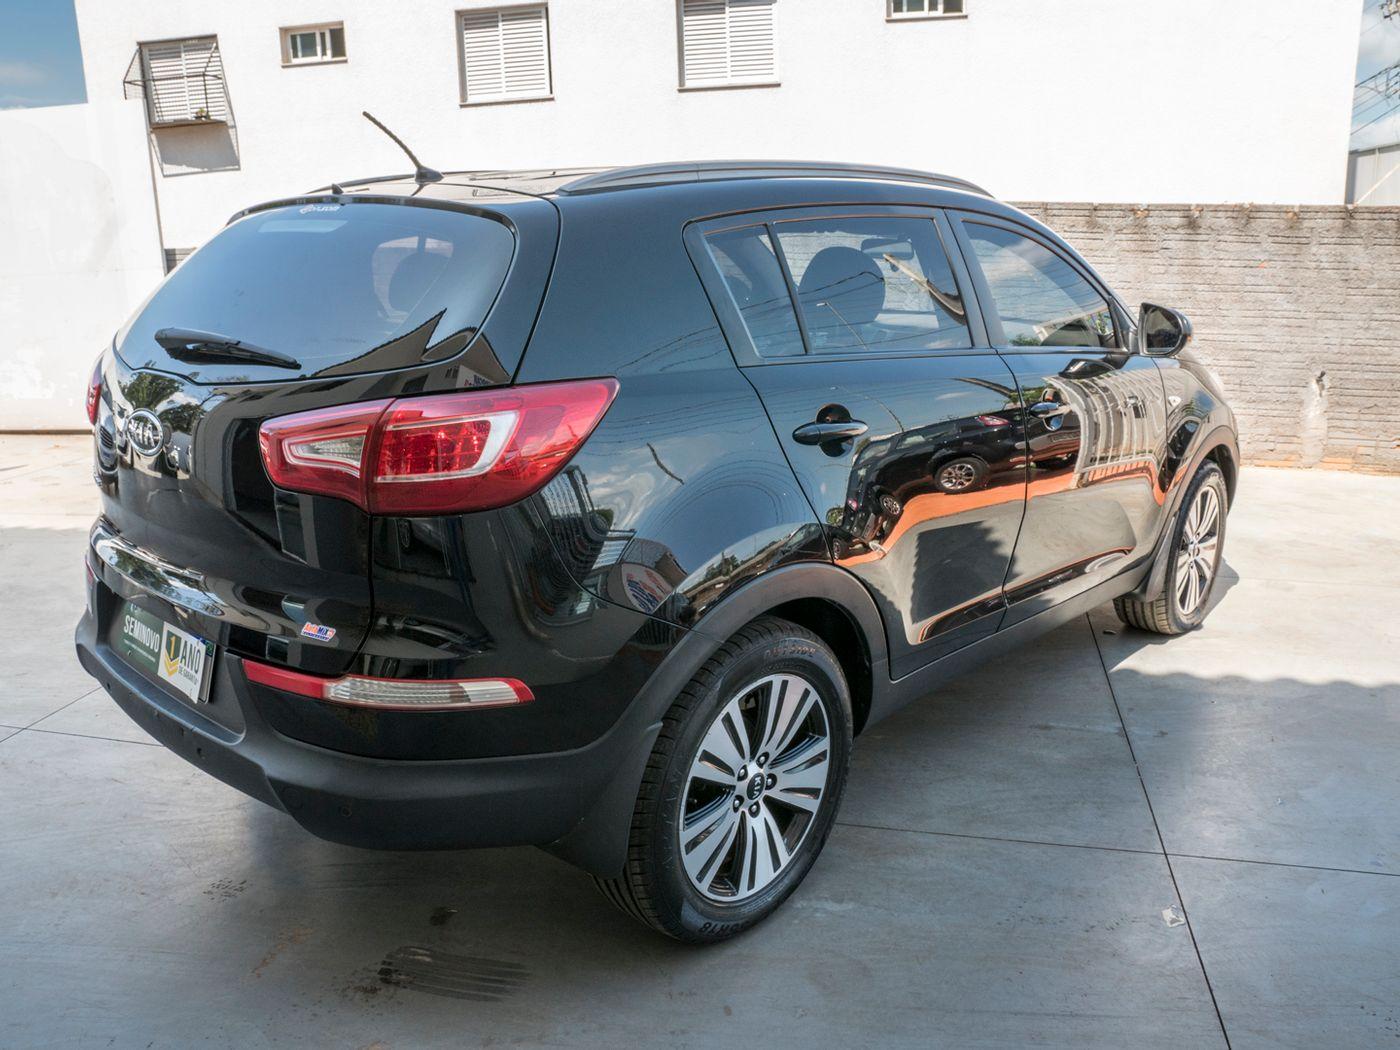 Kia Motors Sportage LX 2.0 16V/ 2.0 16V Flex Mec.